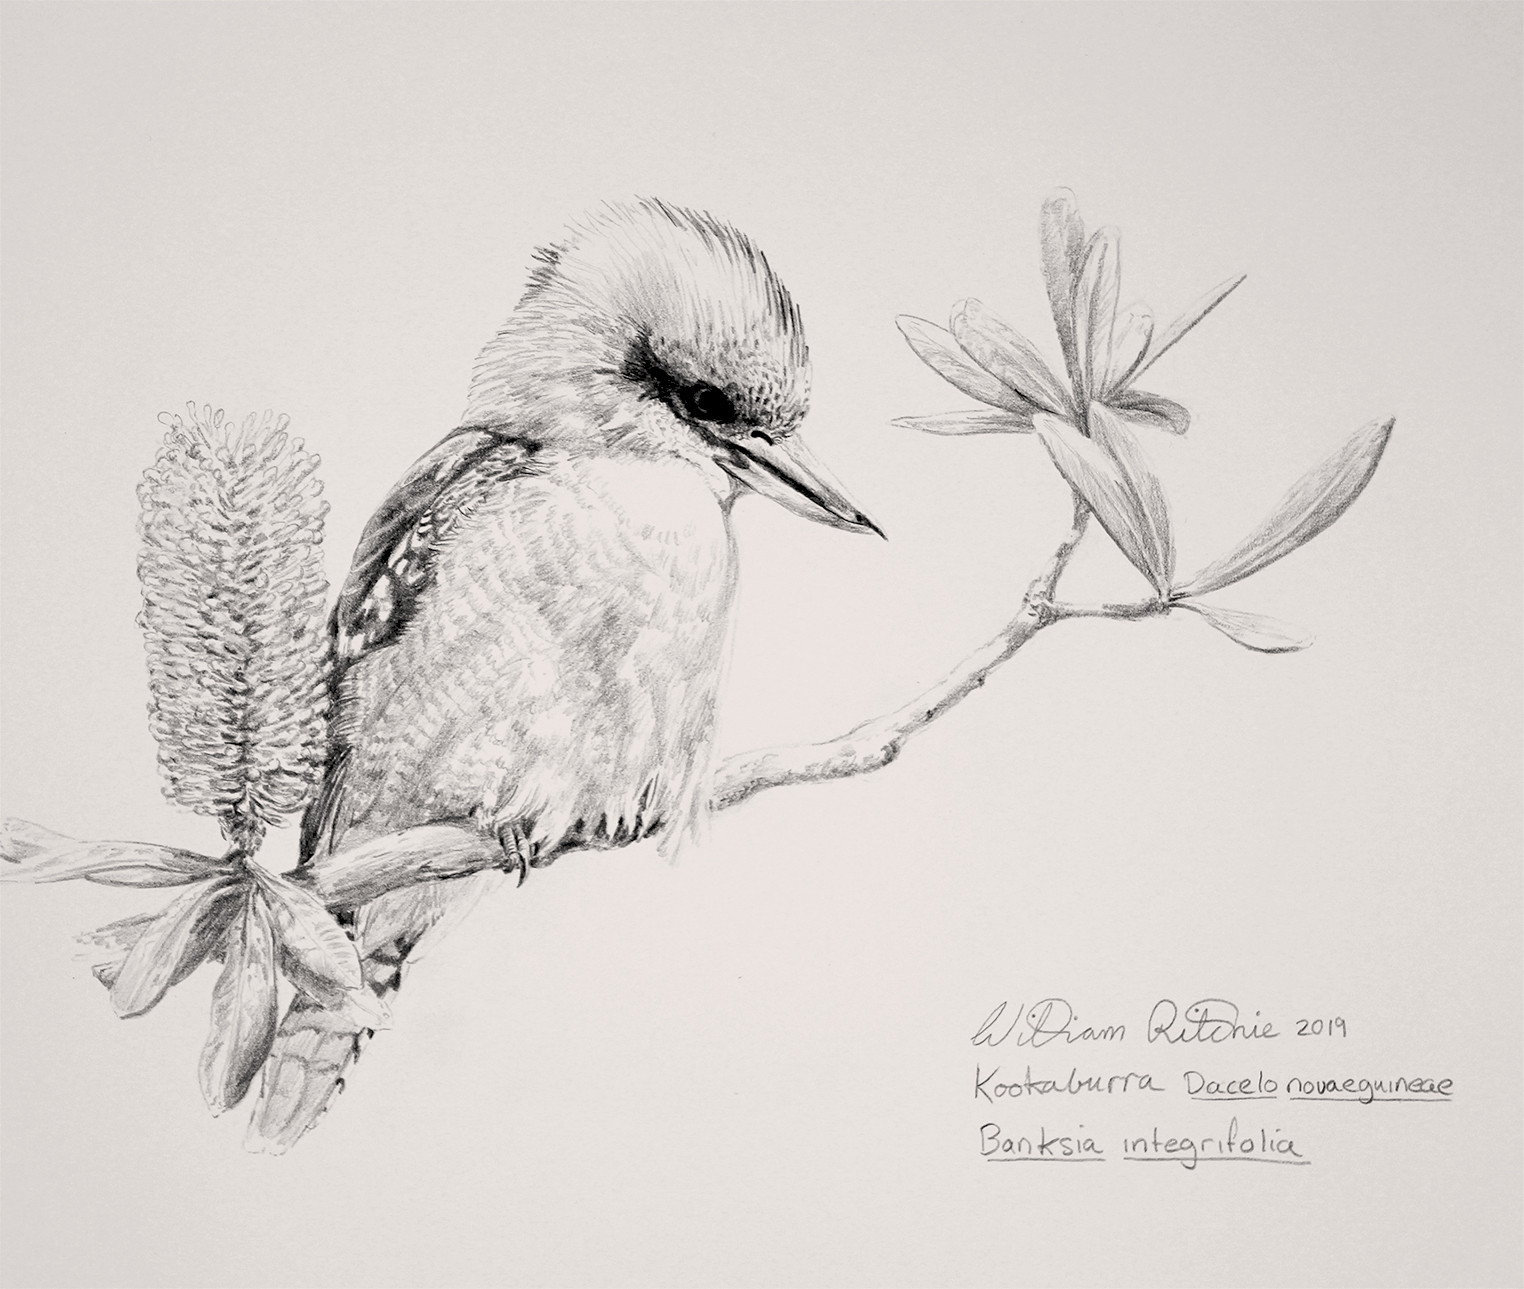 Kookaburra & Banksia